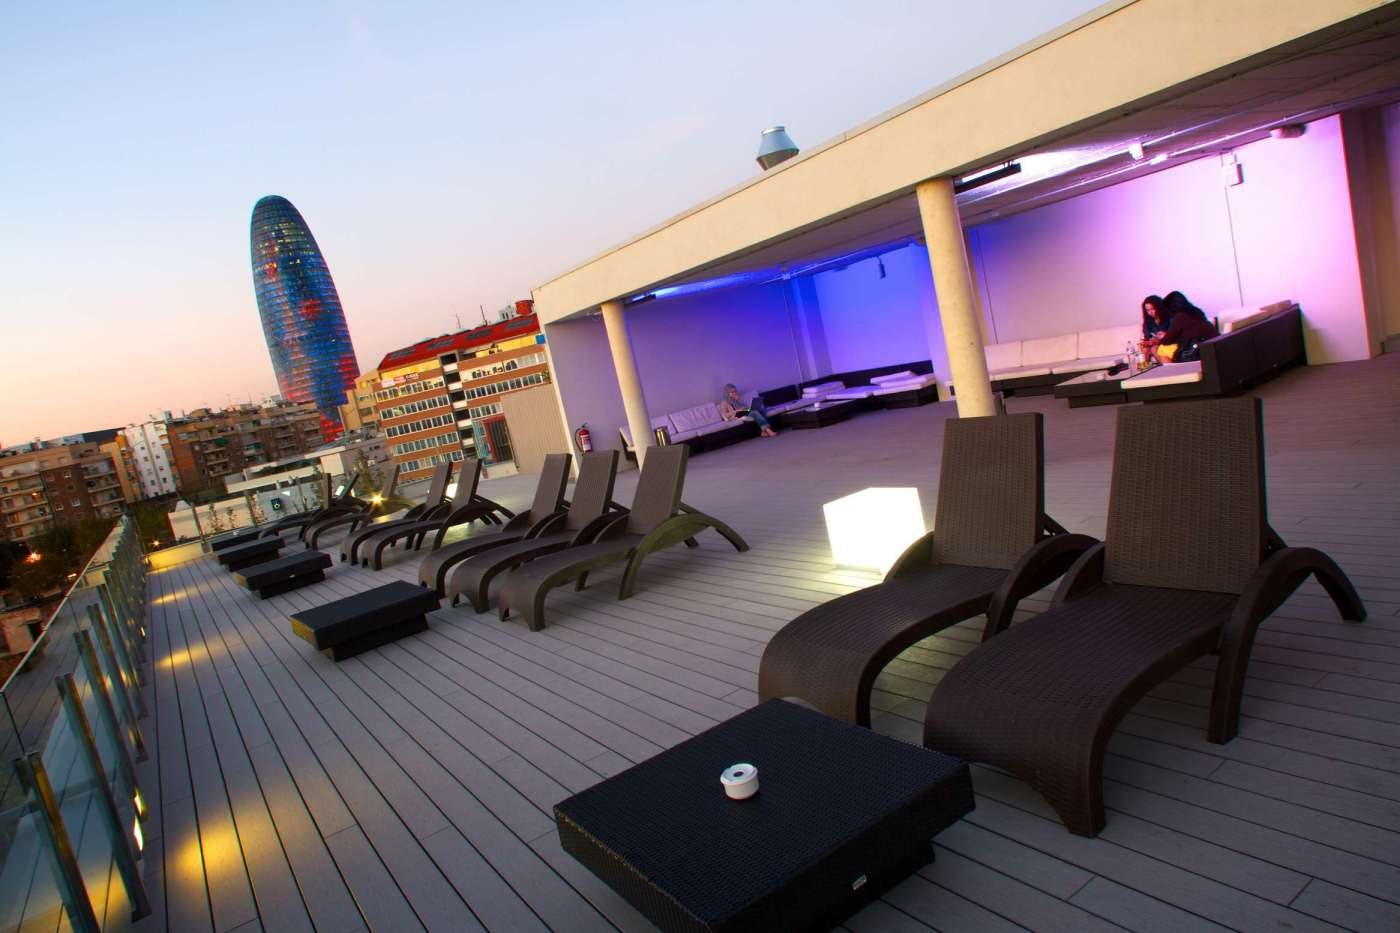 tourisme-eco-responsable-barcelone-terrace4-hotel-twentytu